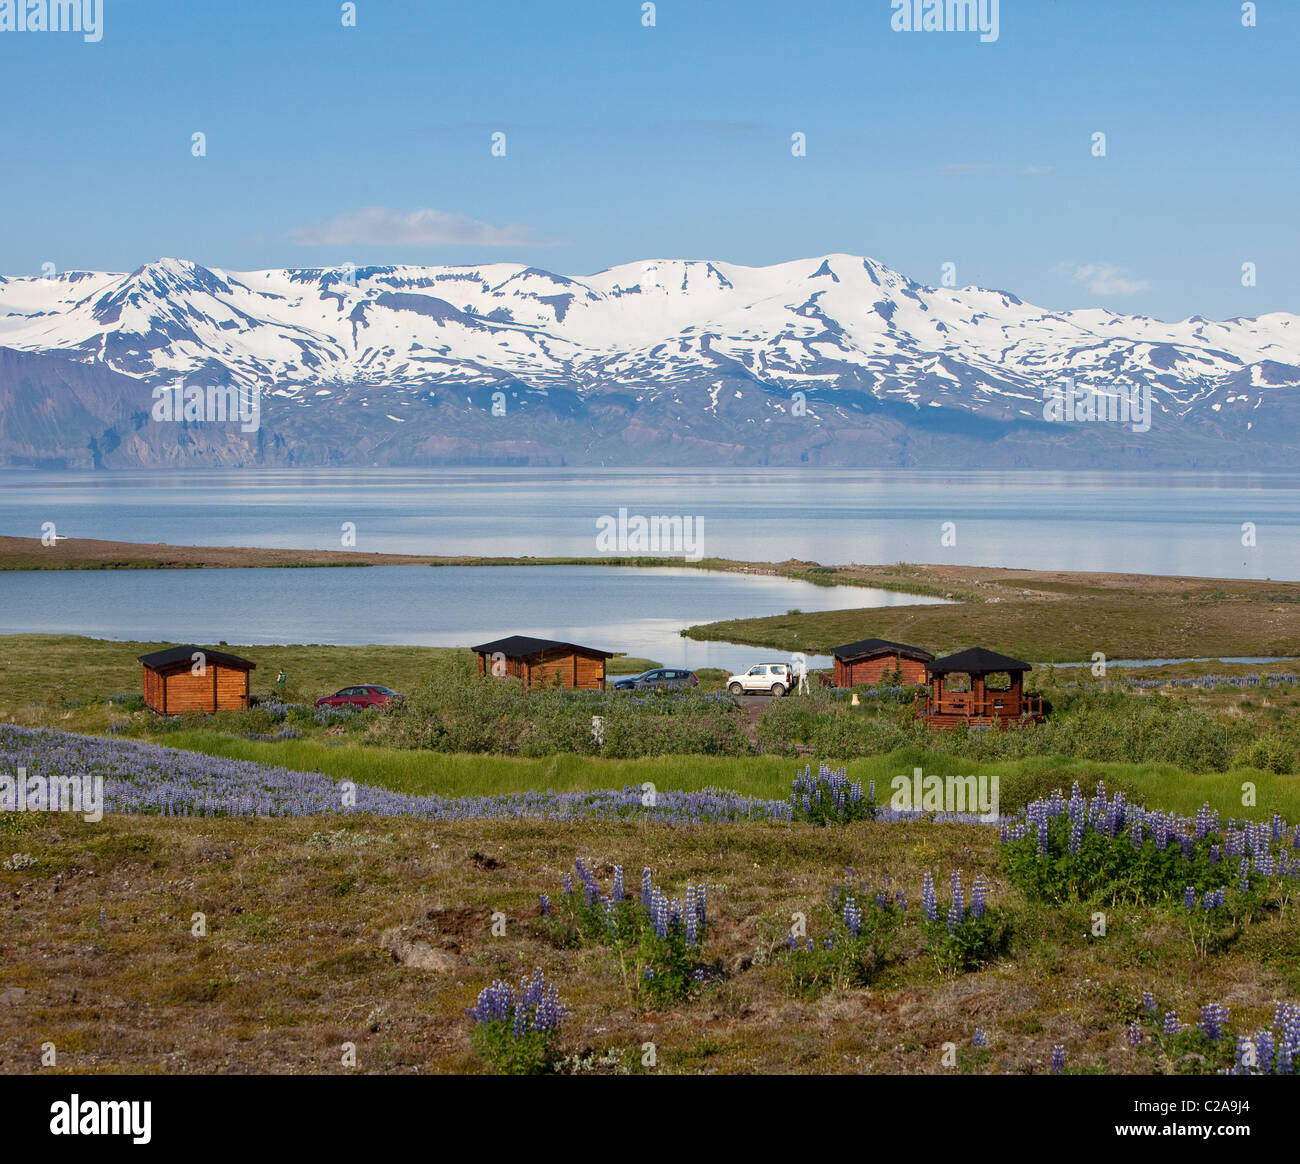 Summer house overlooking water and mountains, Skjalfandi bay, Tjornes Peninsula, Iceland - Stock Image